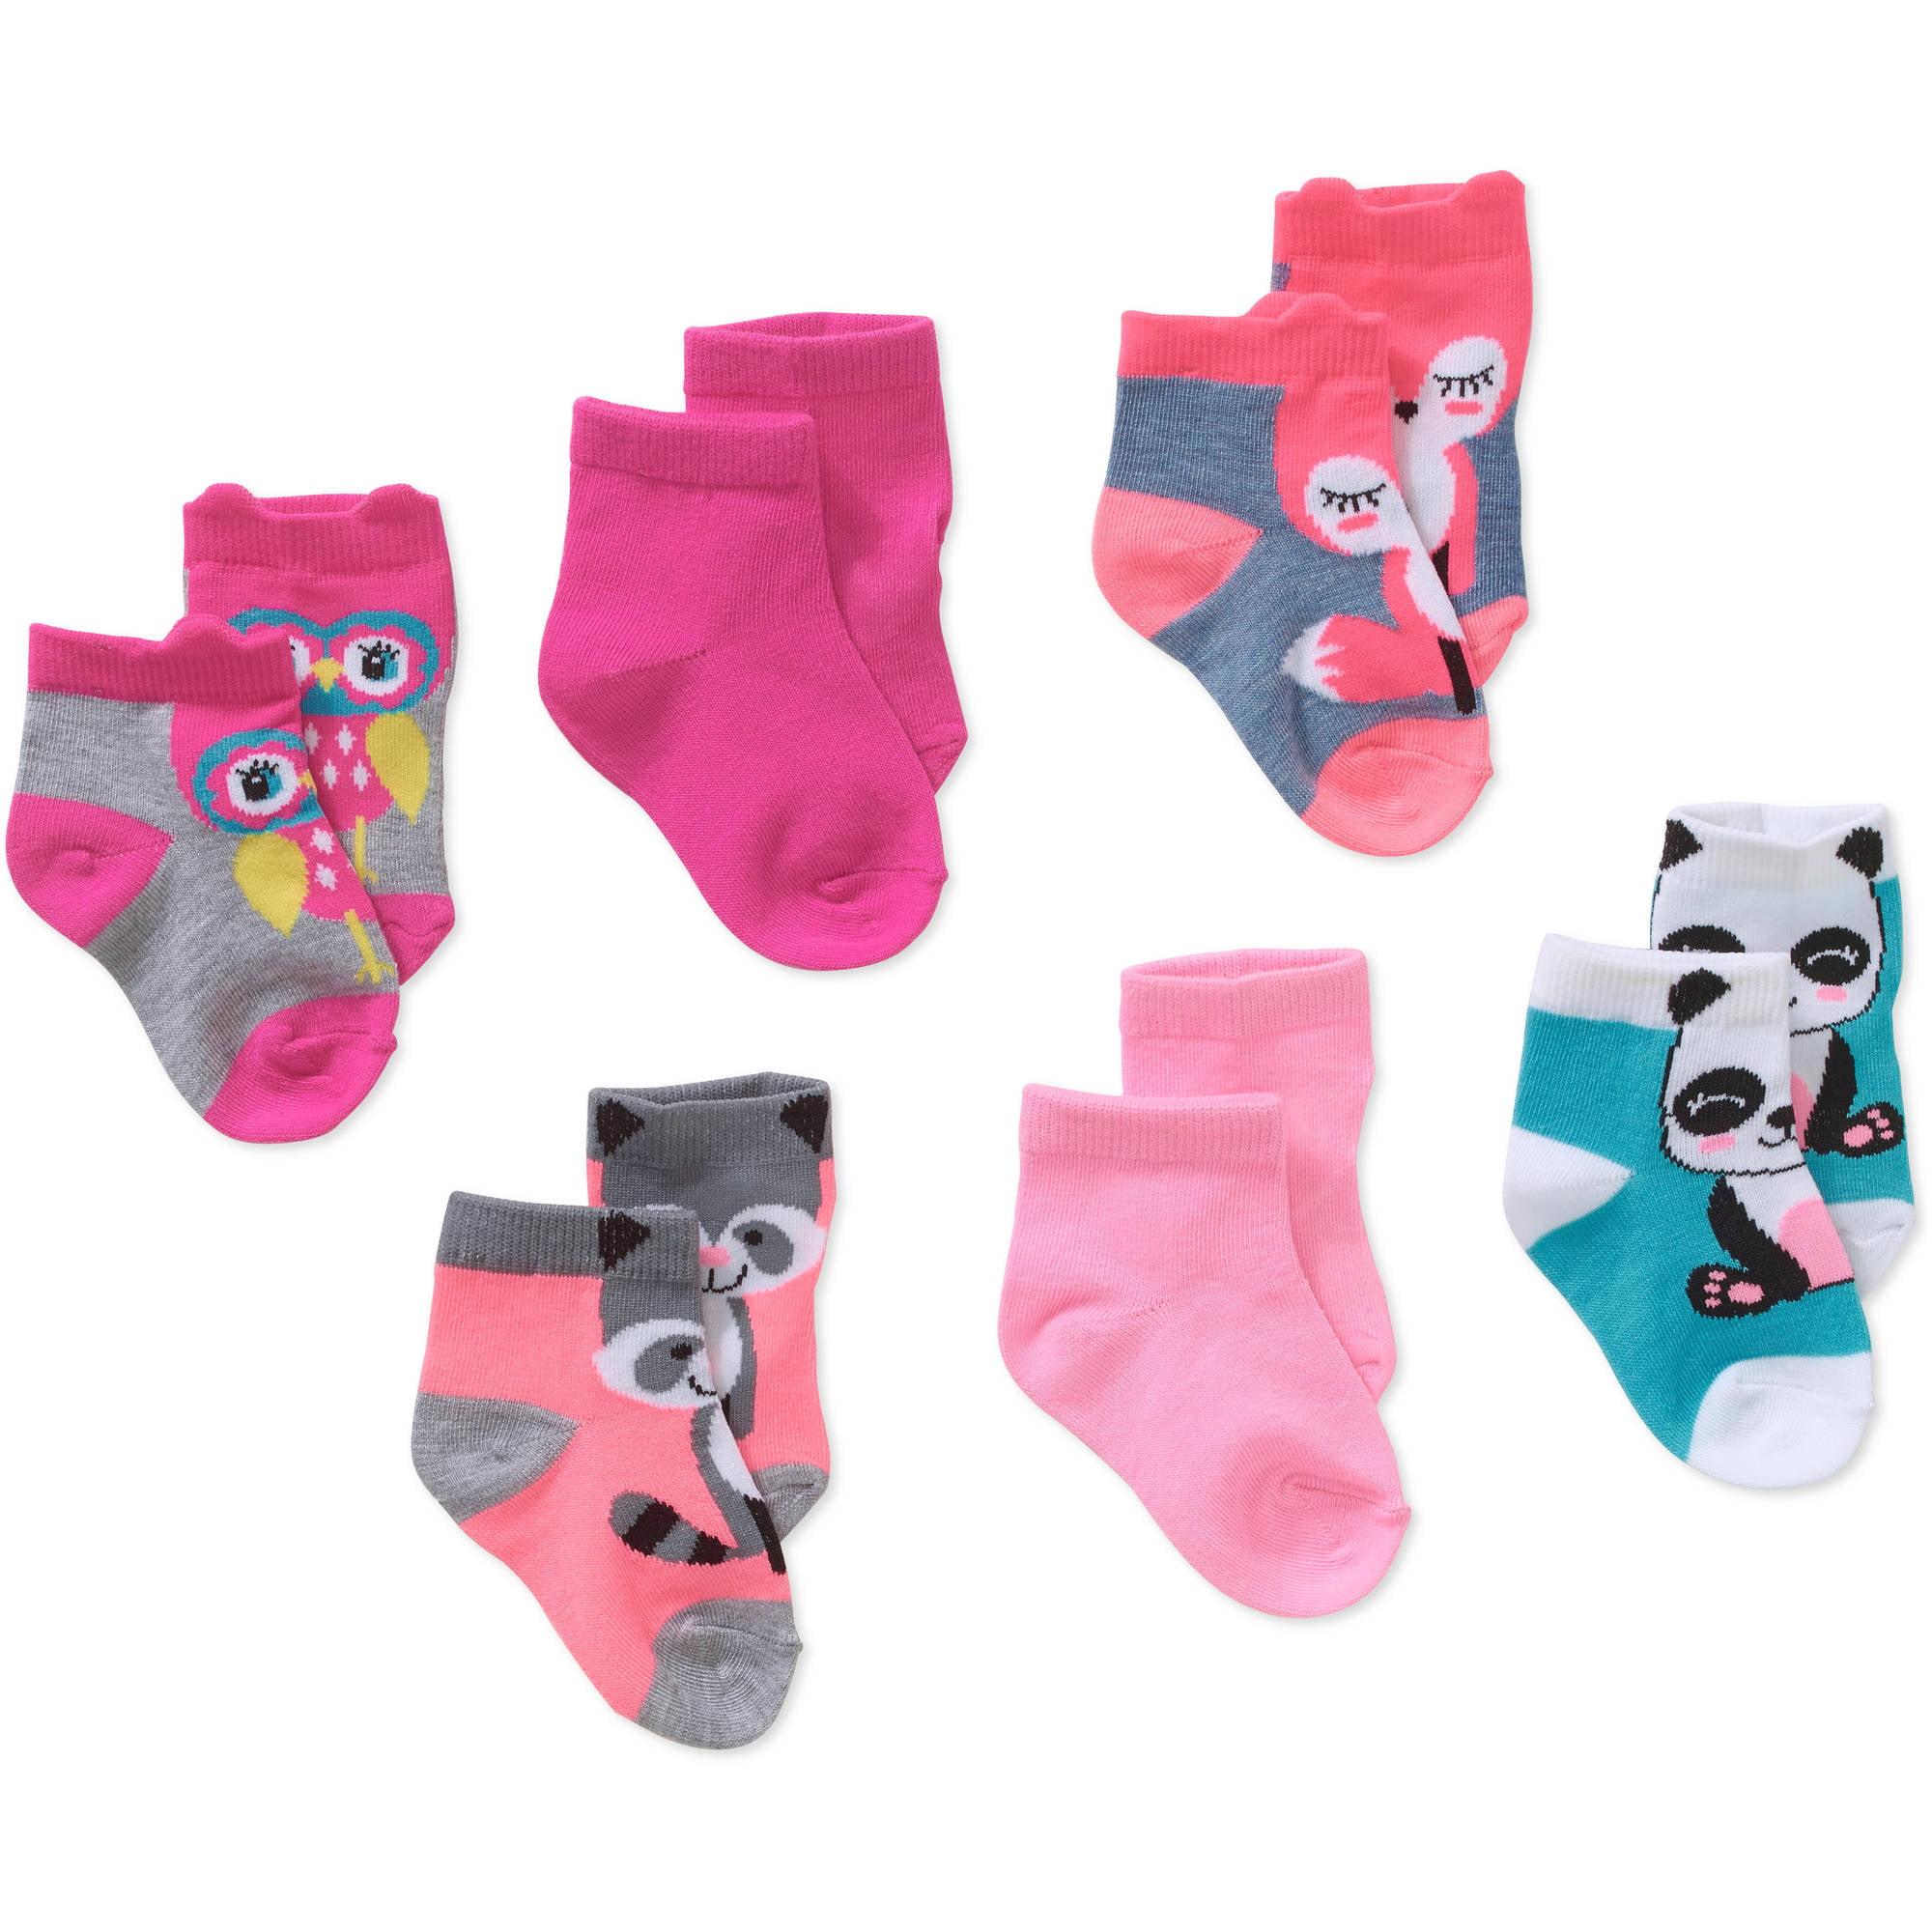 Girls 0-6 month socks pink flowers Garanimals